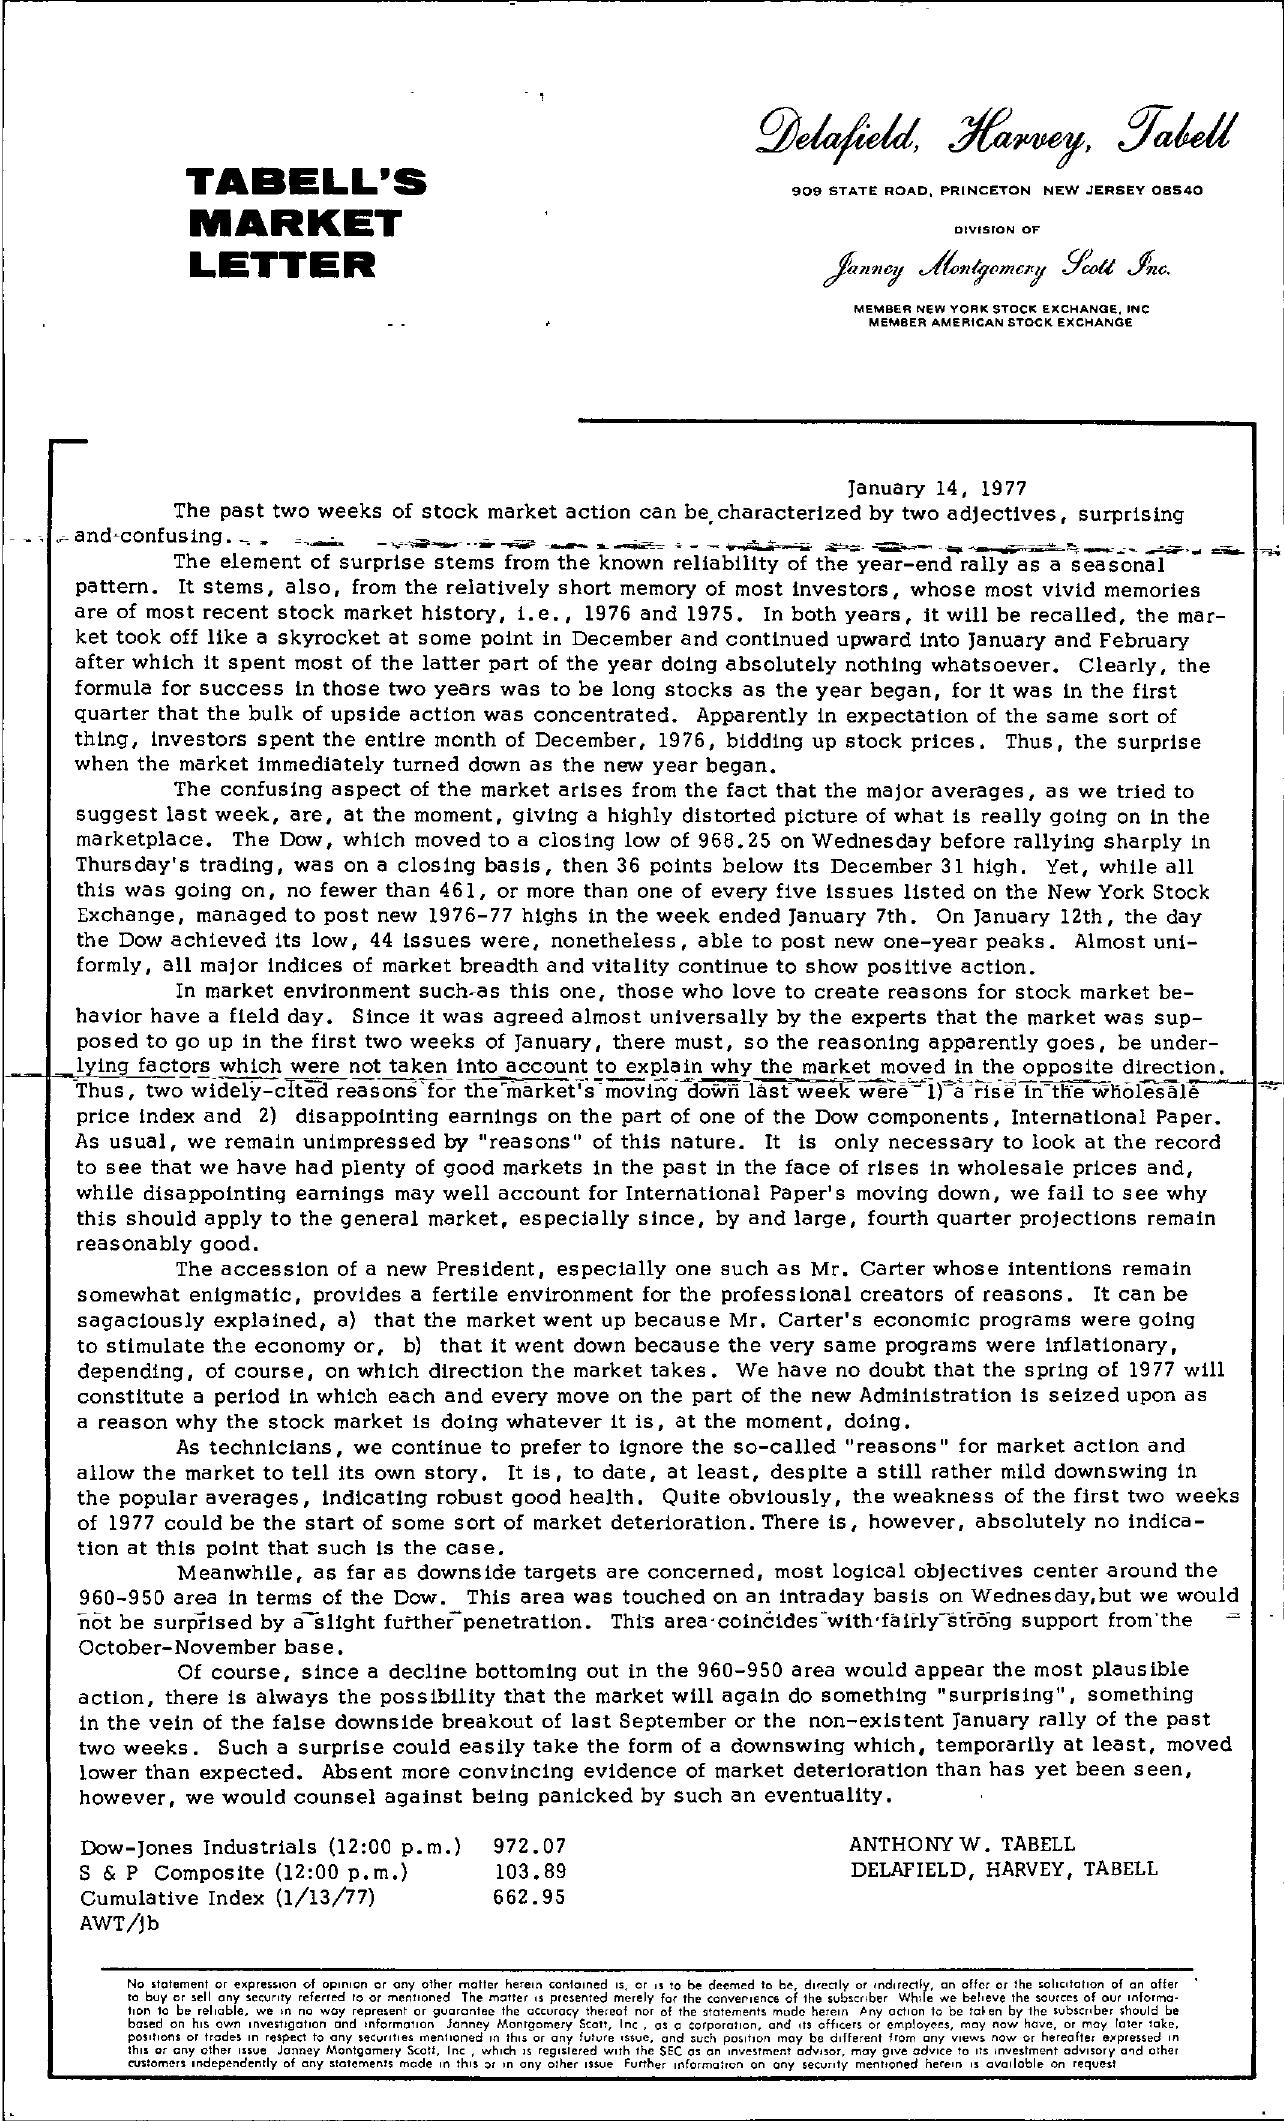 Tabell's Market Letter - January 14, 1977